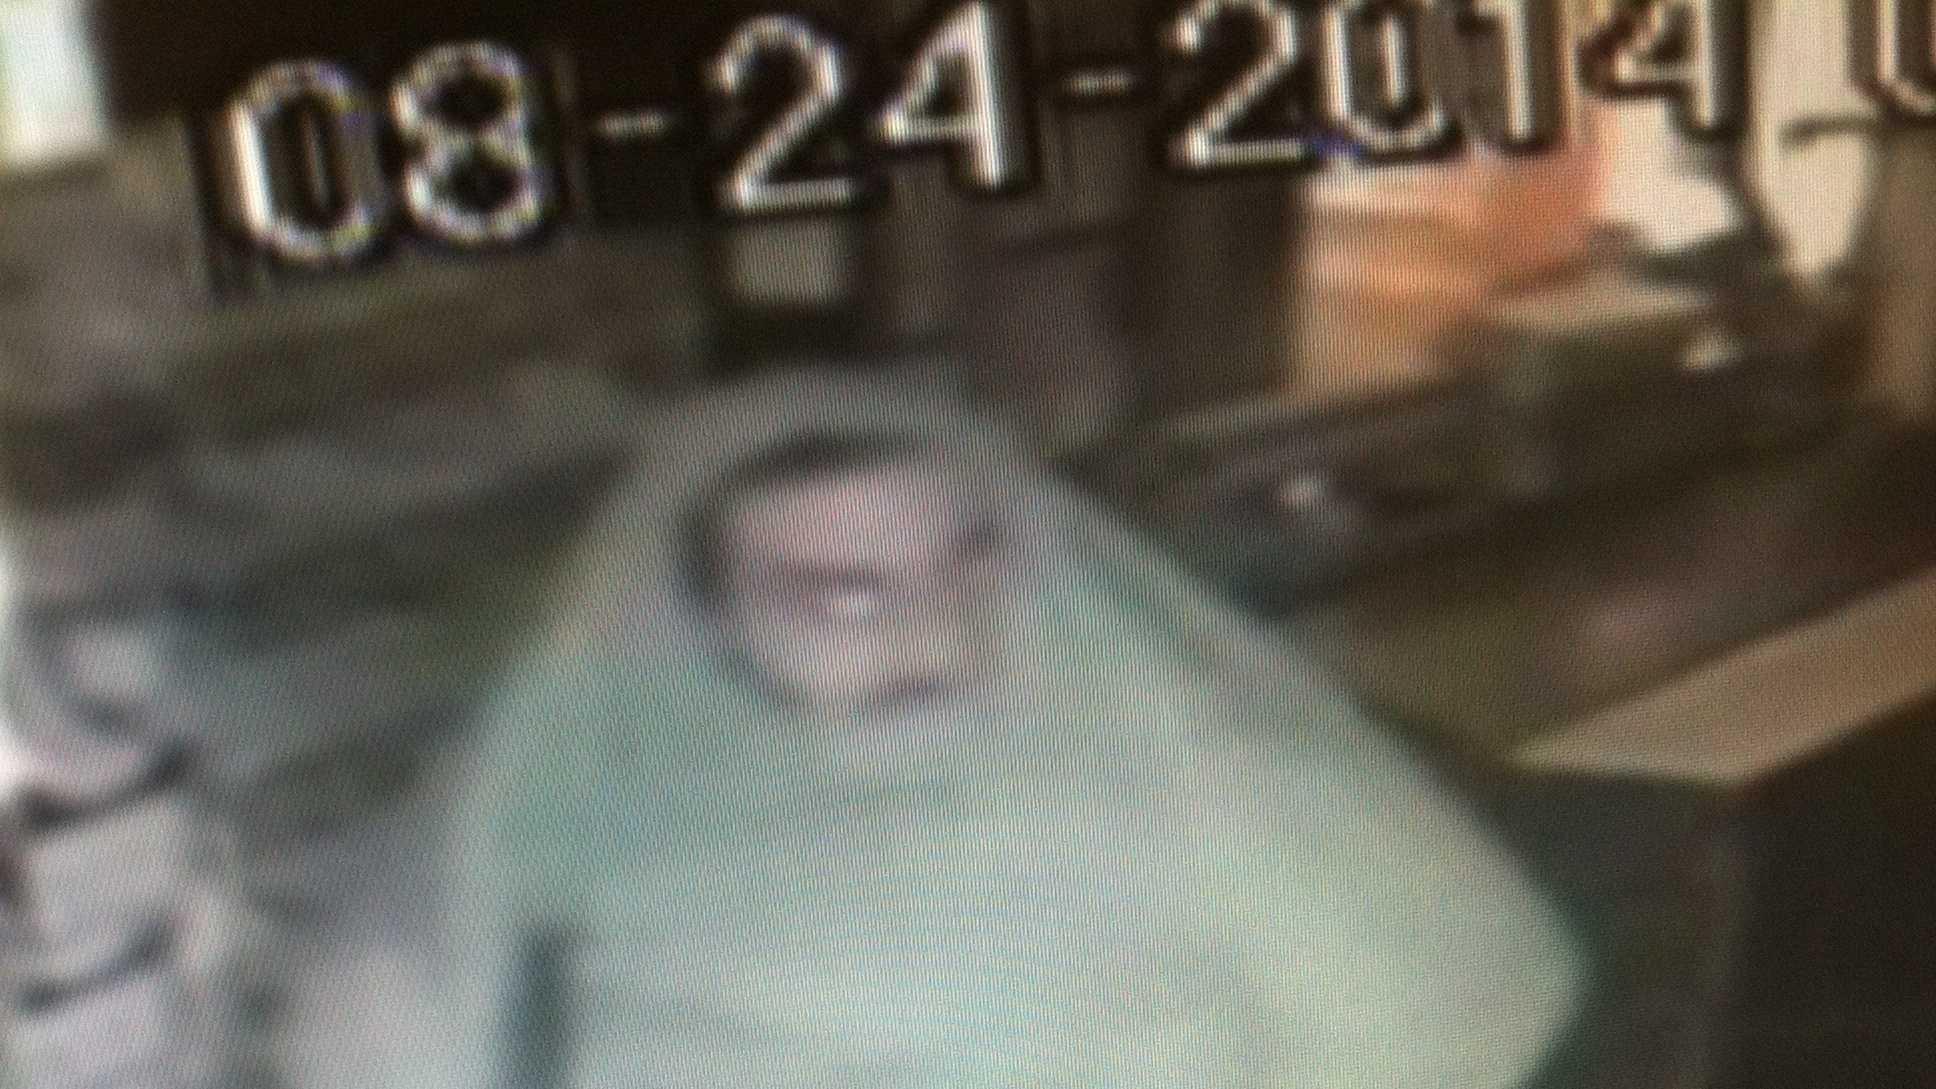 rockingham shell station robbery suspect